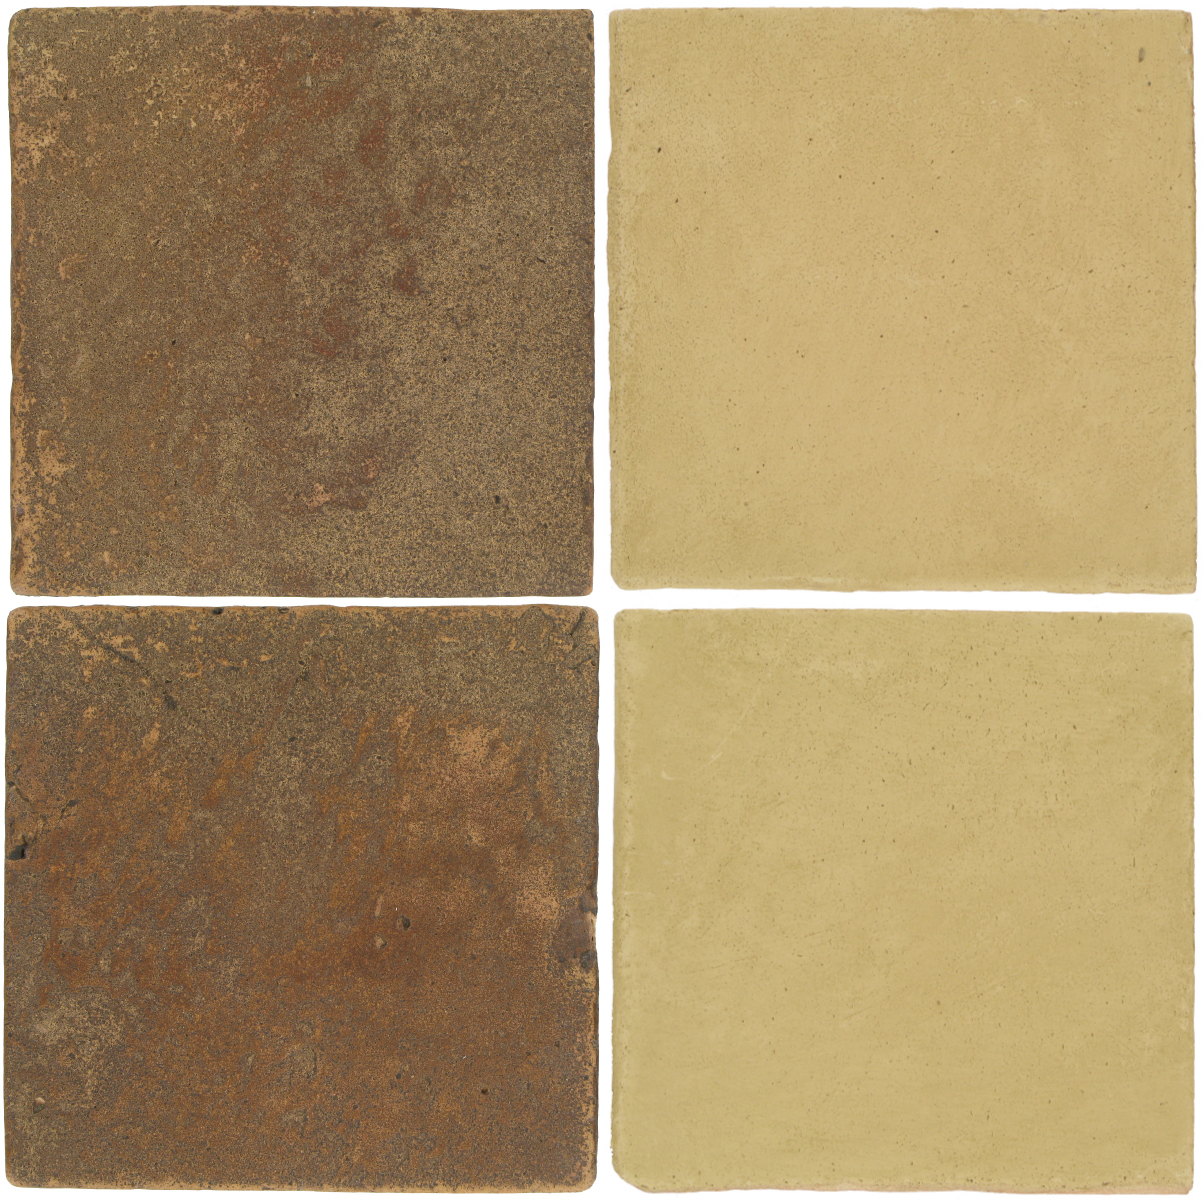 Pedralbes Antique Terracotta  2 Color Combinations  VTG-PSCM Camel Brown + OHS-PGGW Golden W.